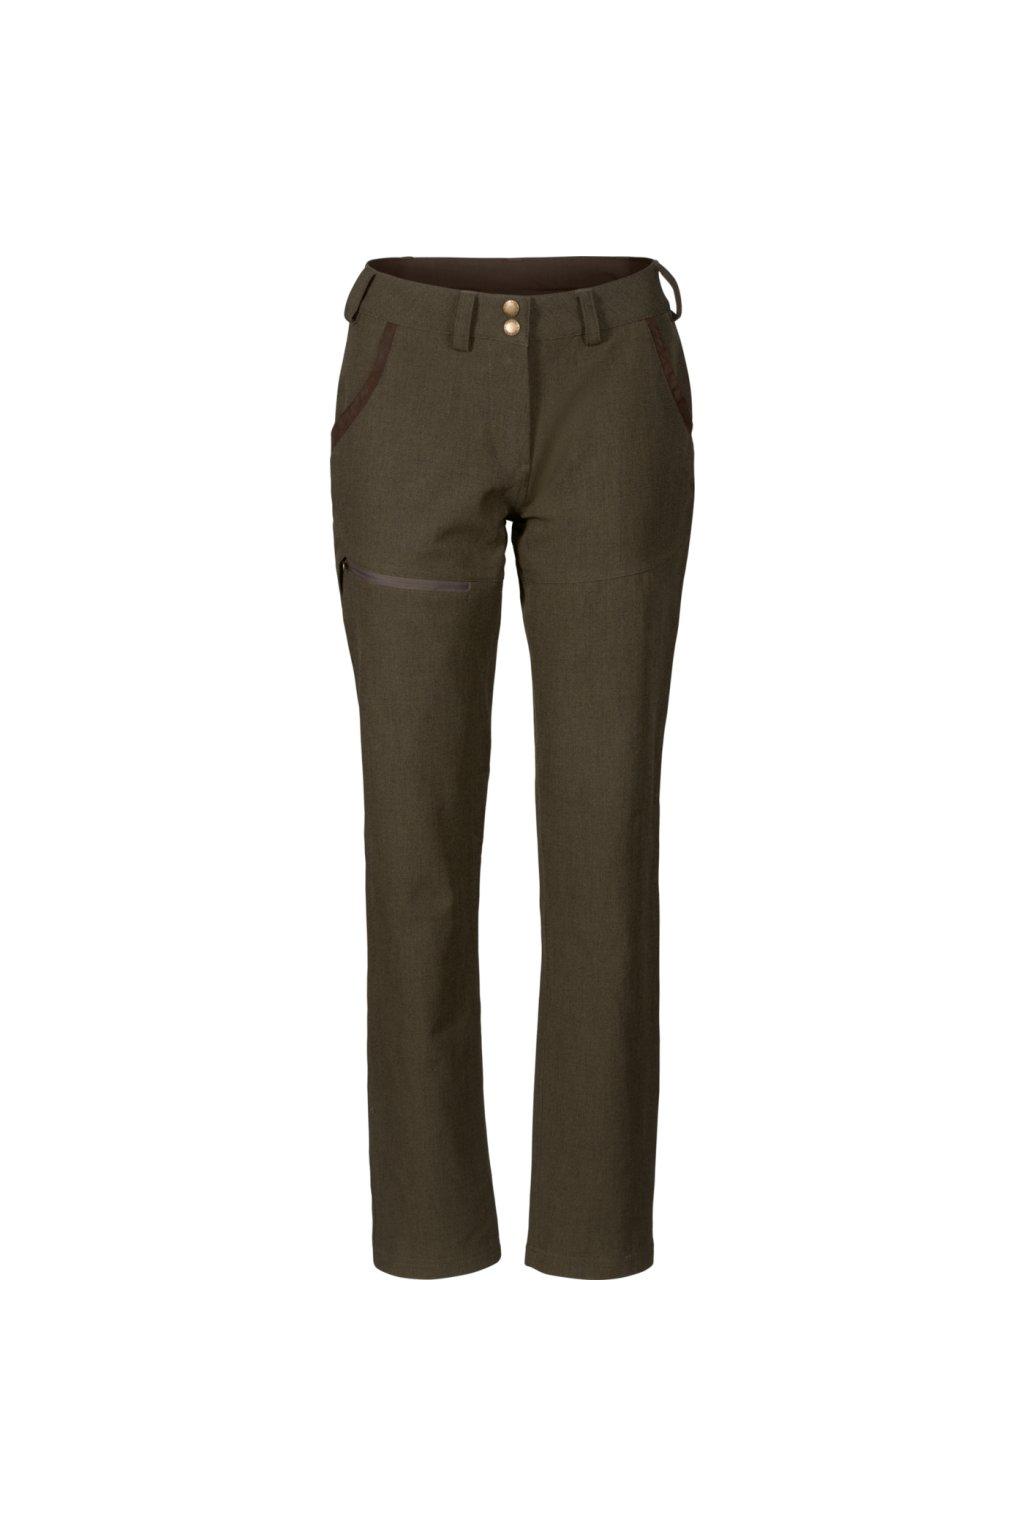 Seeland - Woodcock Advanced kalhoty dámské NOVINKA 2020